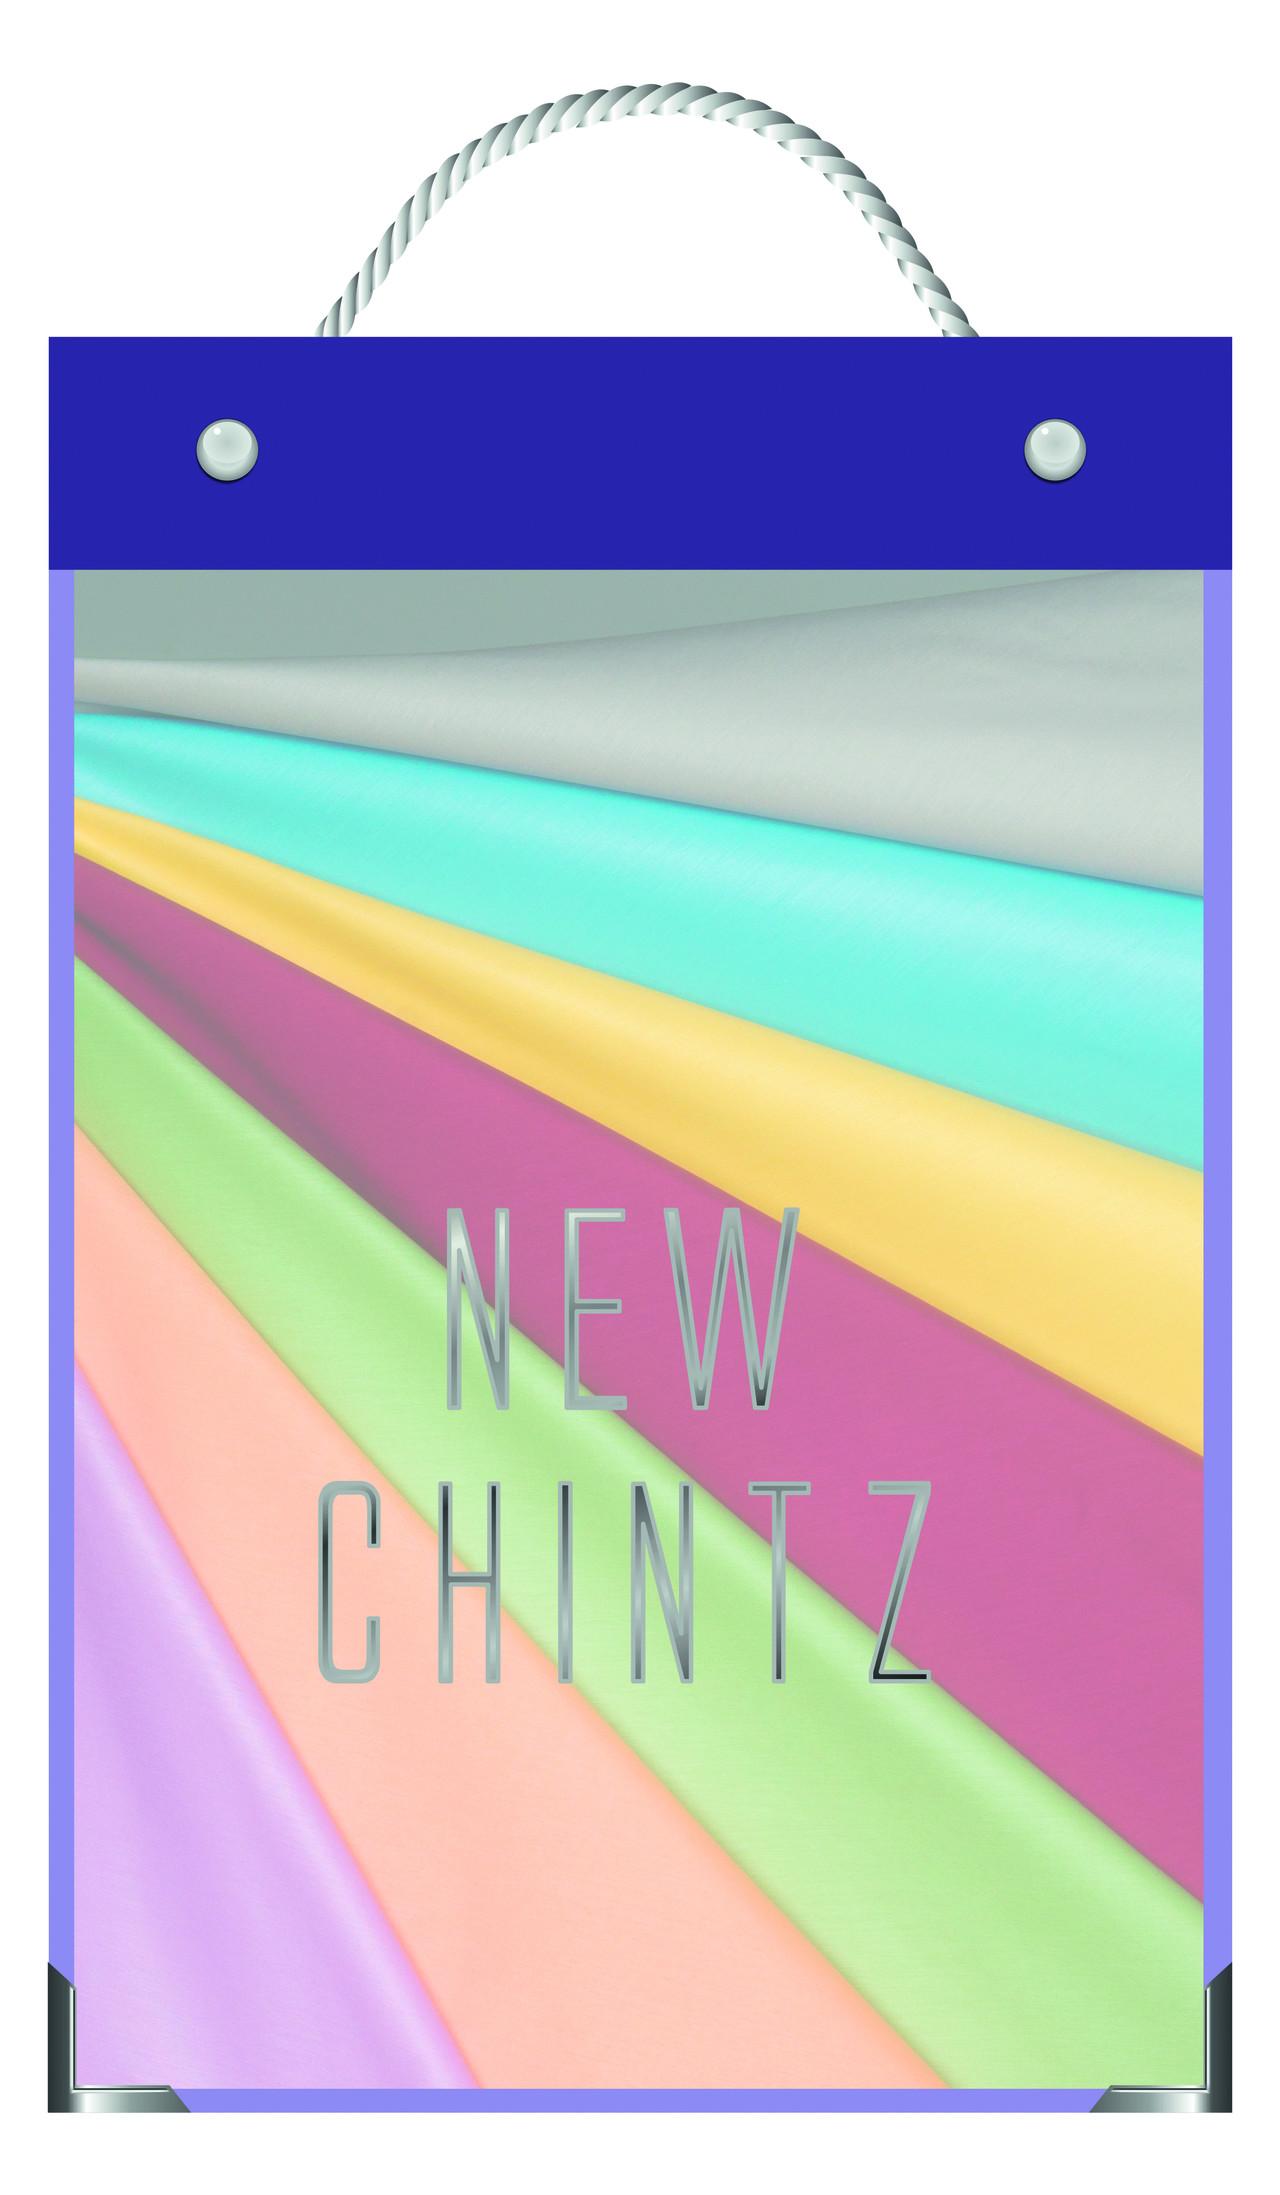 New Chintz WIN DECO